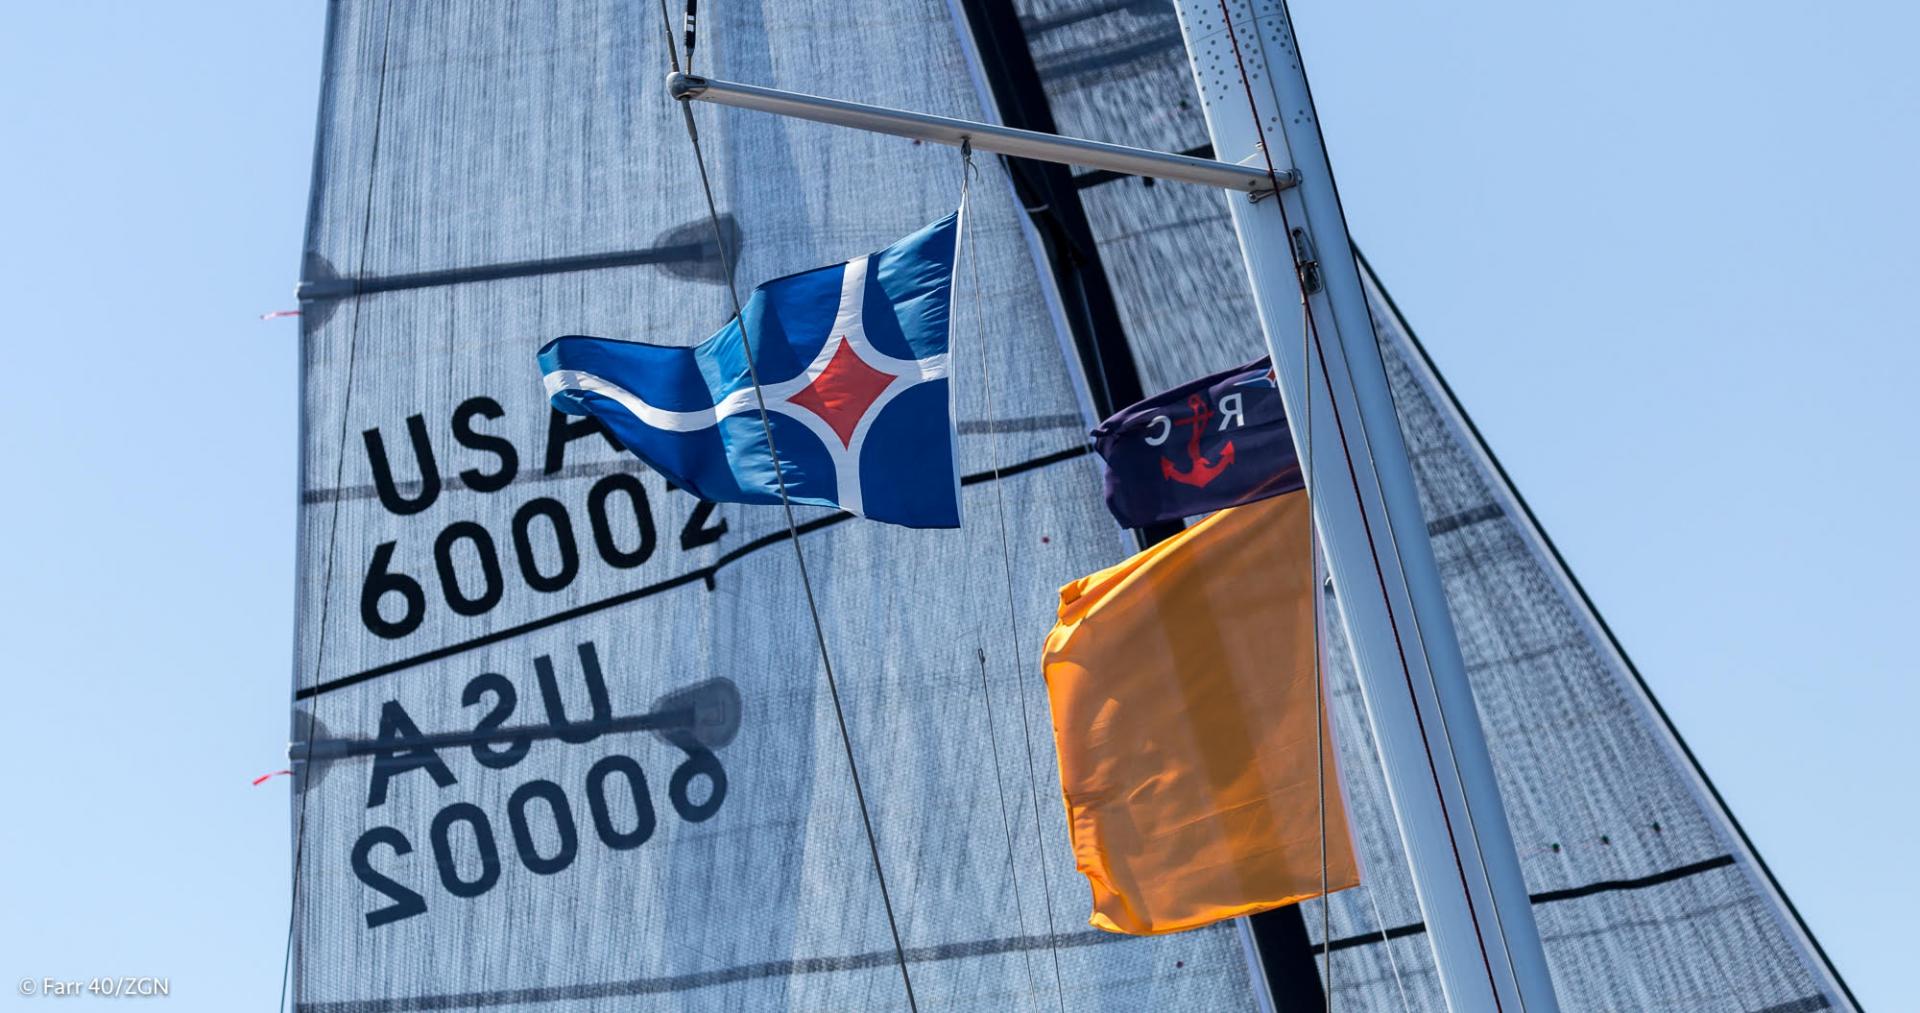 FARR 40 Pre-Worlds - Foto online - NEWS - Yacht Club Costa Smeralda